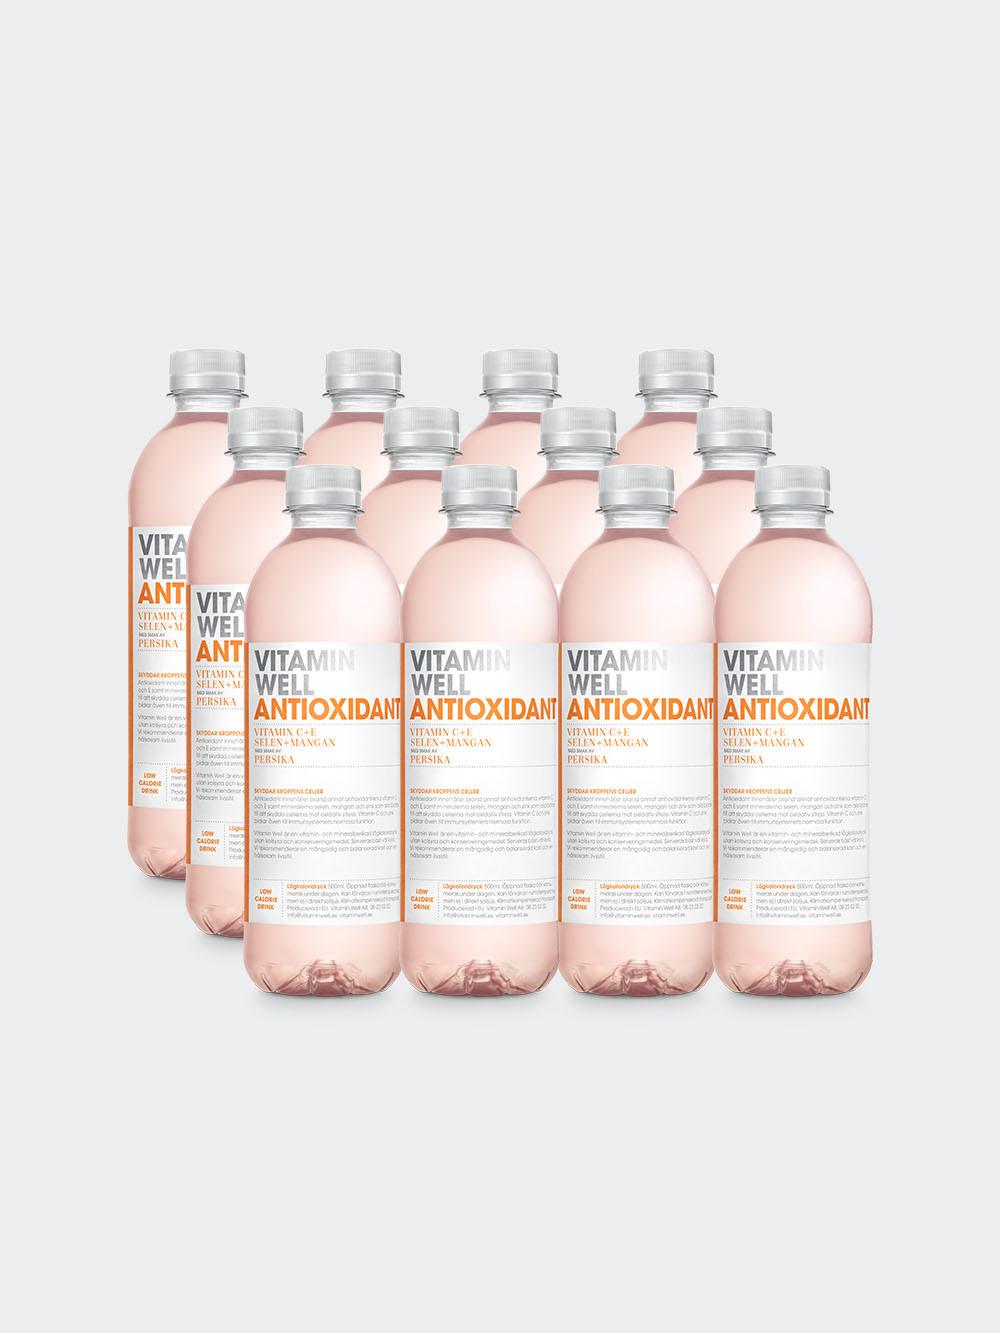 Vitamin Well Antioxidant 12-pack